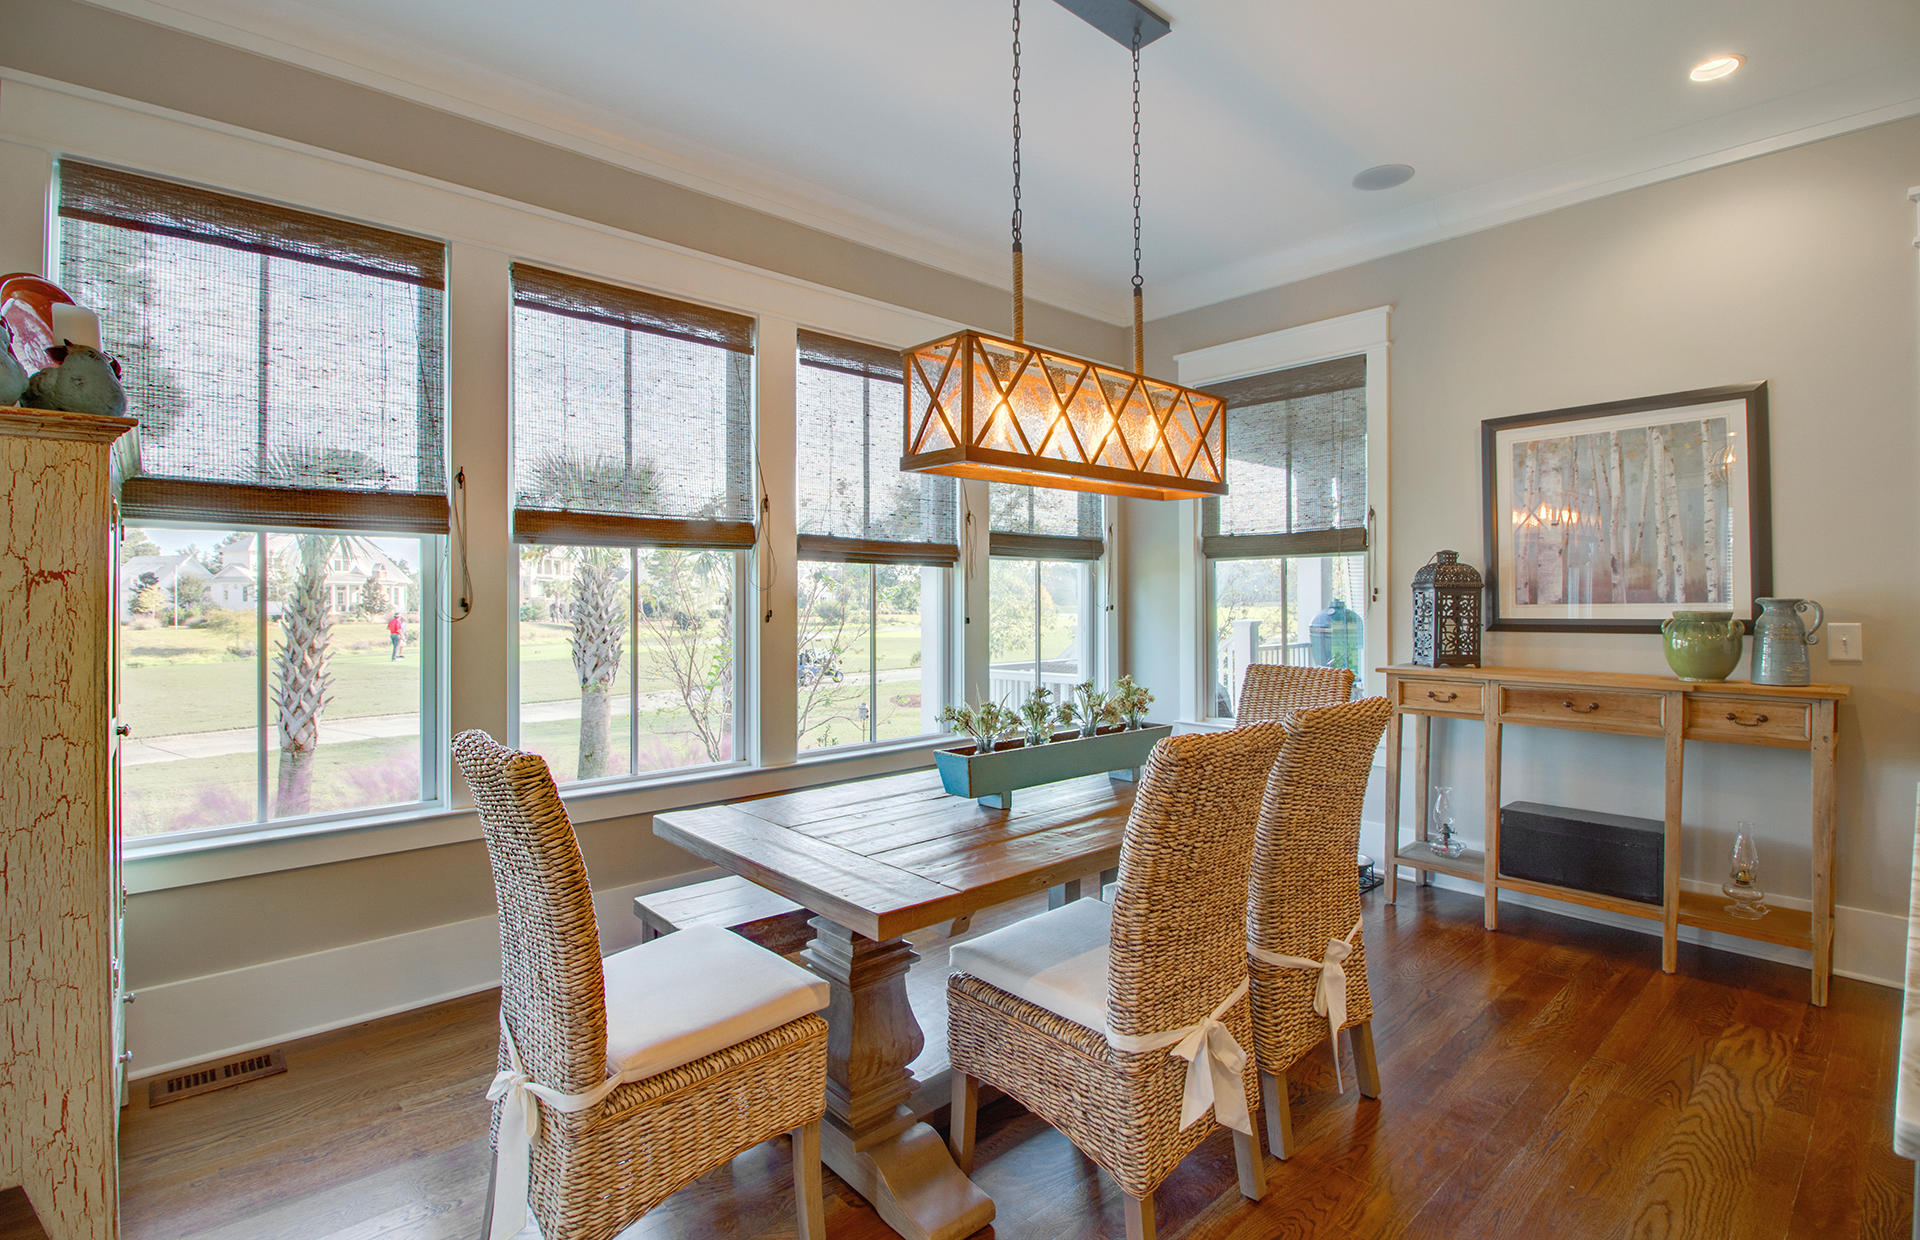 Daniel Island Park Homes For Sale - 117 Brailsford, Charleston, SC - 0